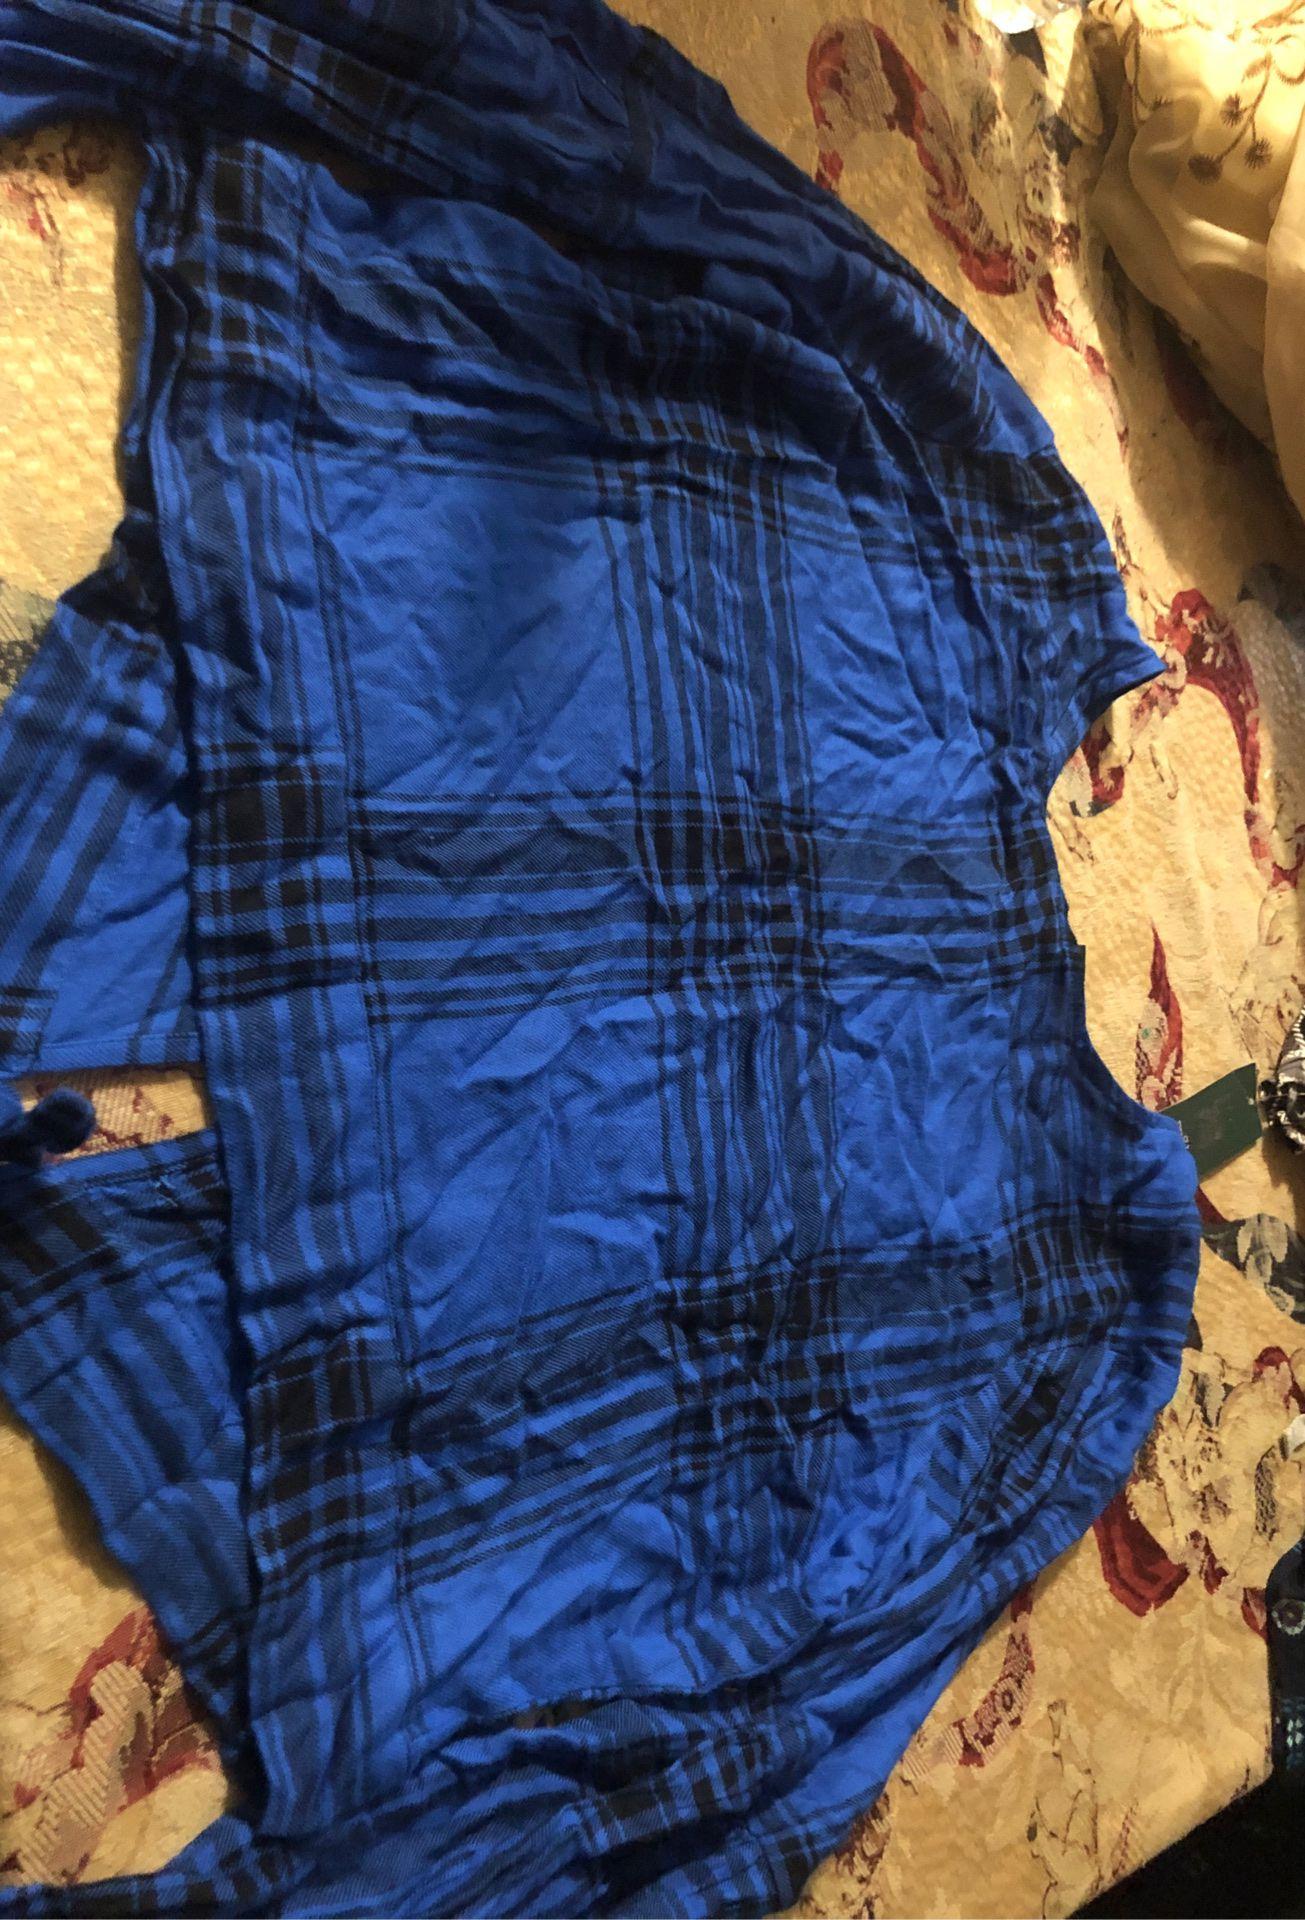 Xxl blue blouse